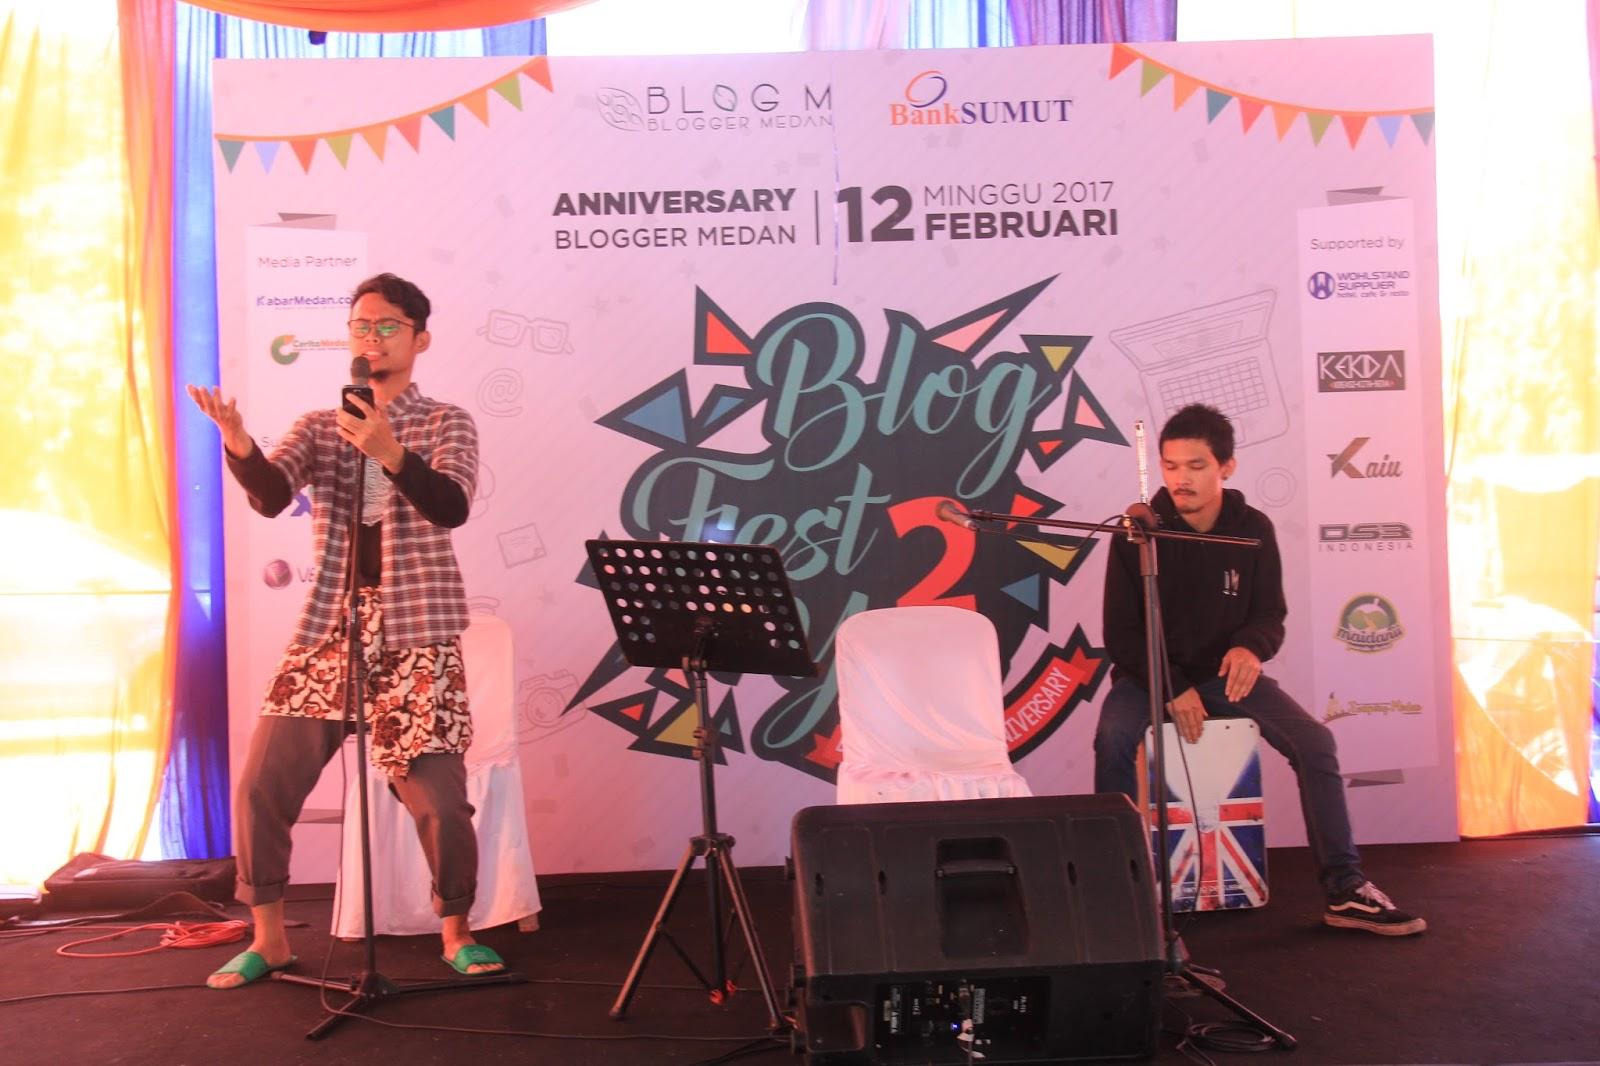 blogfest 2 you, sebuah cerita di tahun ke2 blogger medan